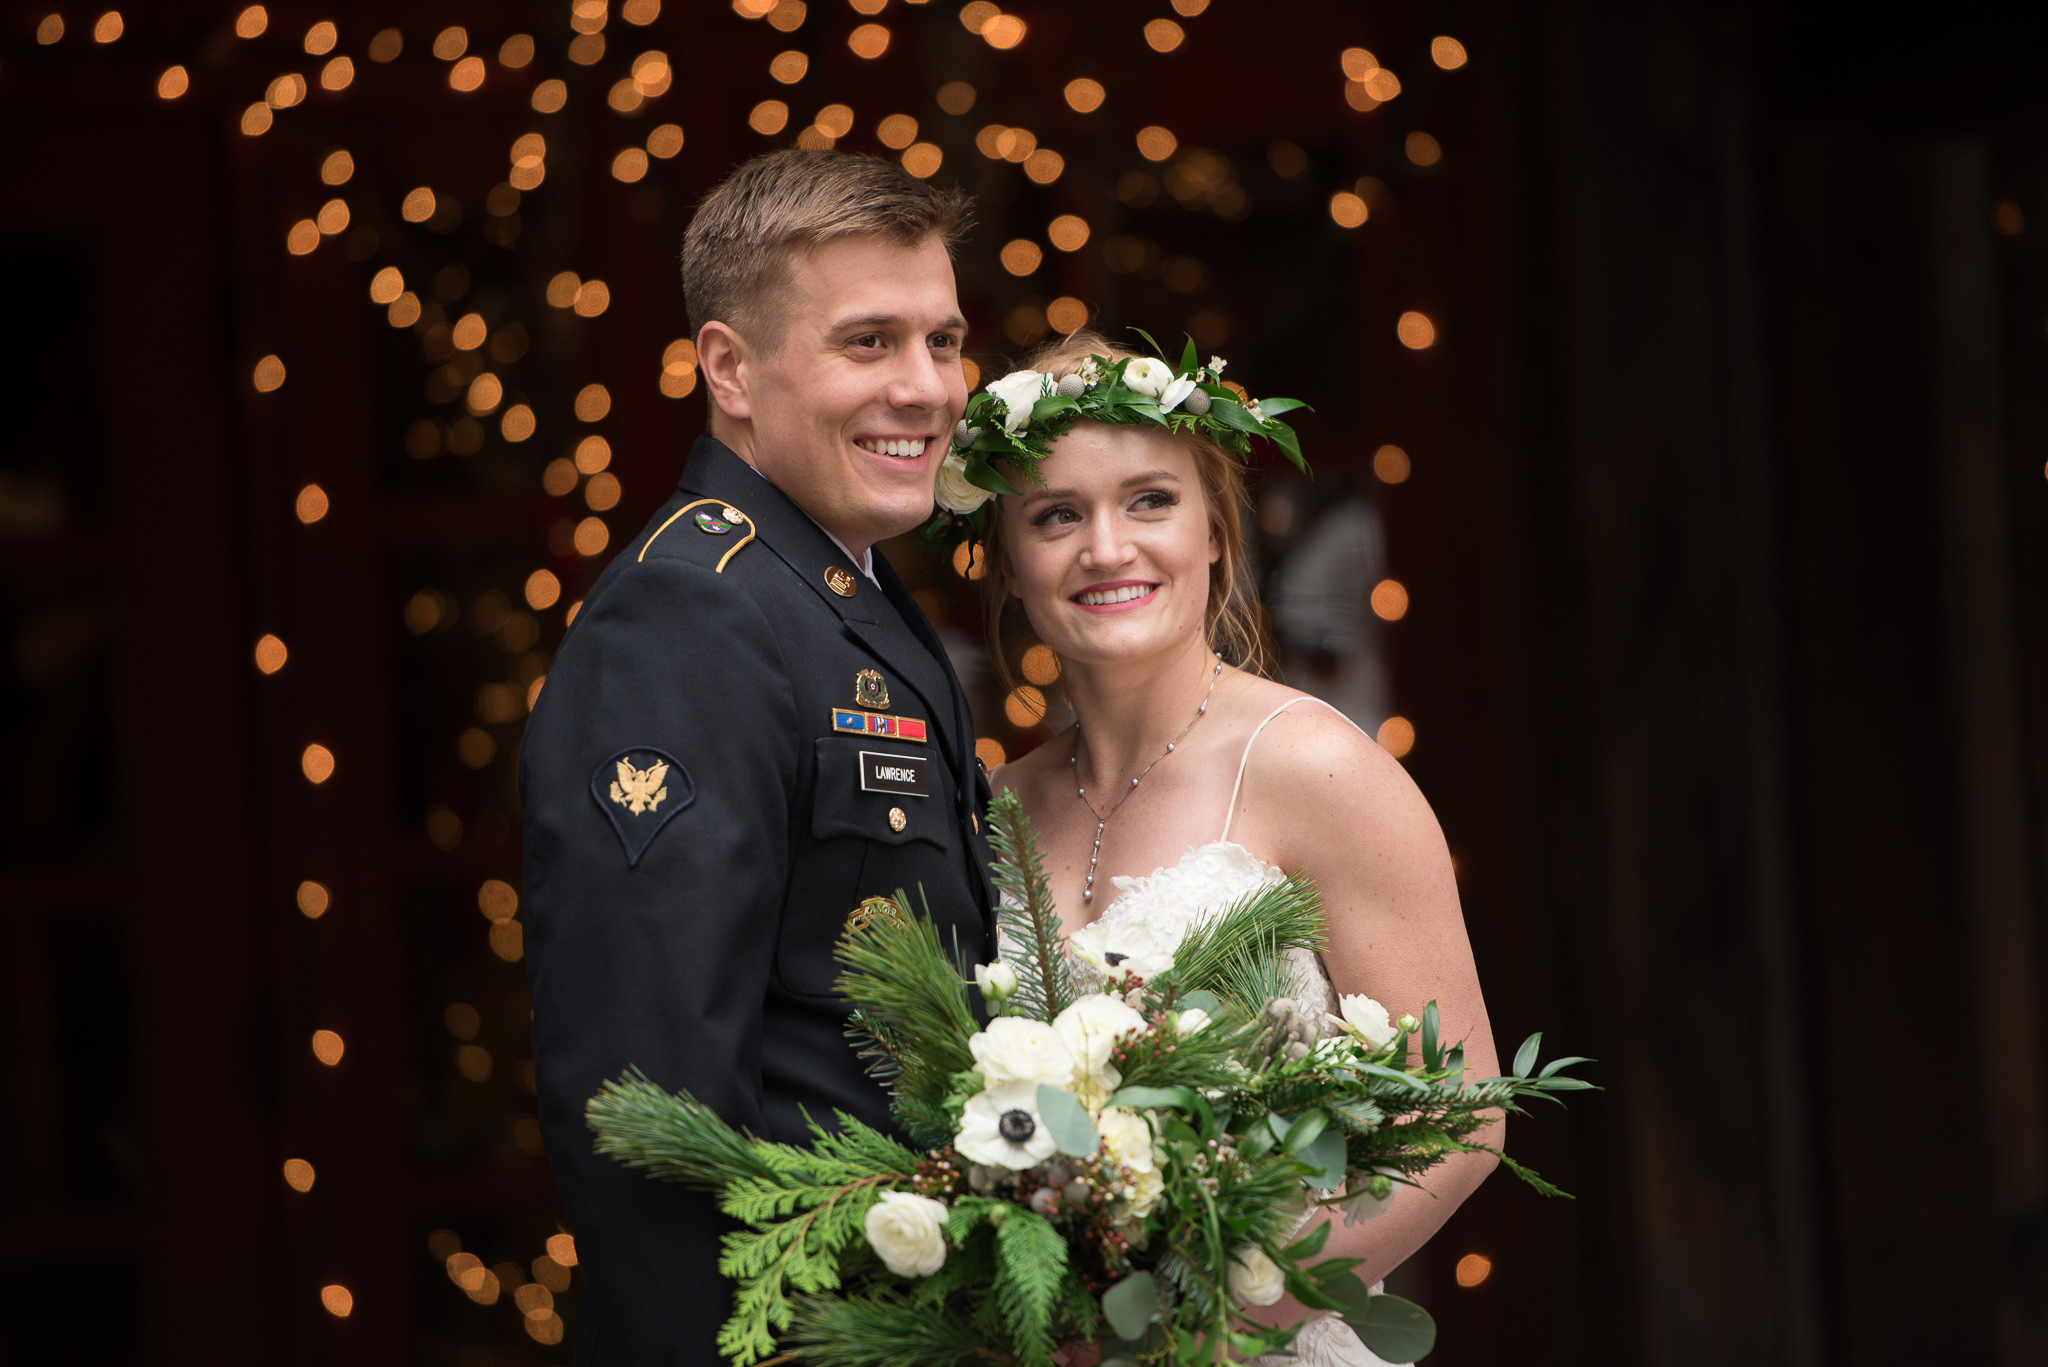 Trevor-Hooper-Wedding-Photographer-The-Bungalow-Wedding-Utah_CLR_020.jpg